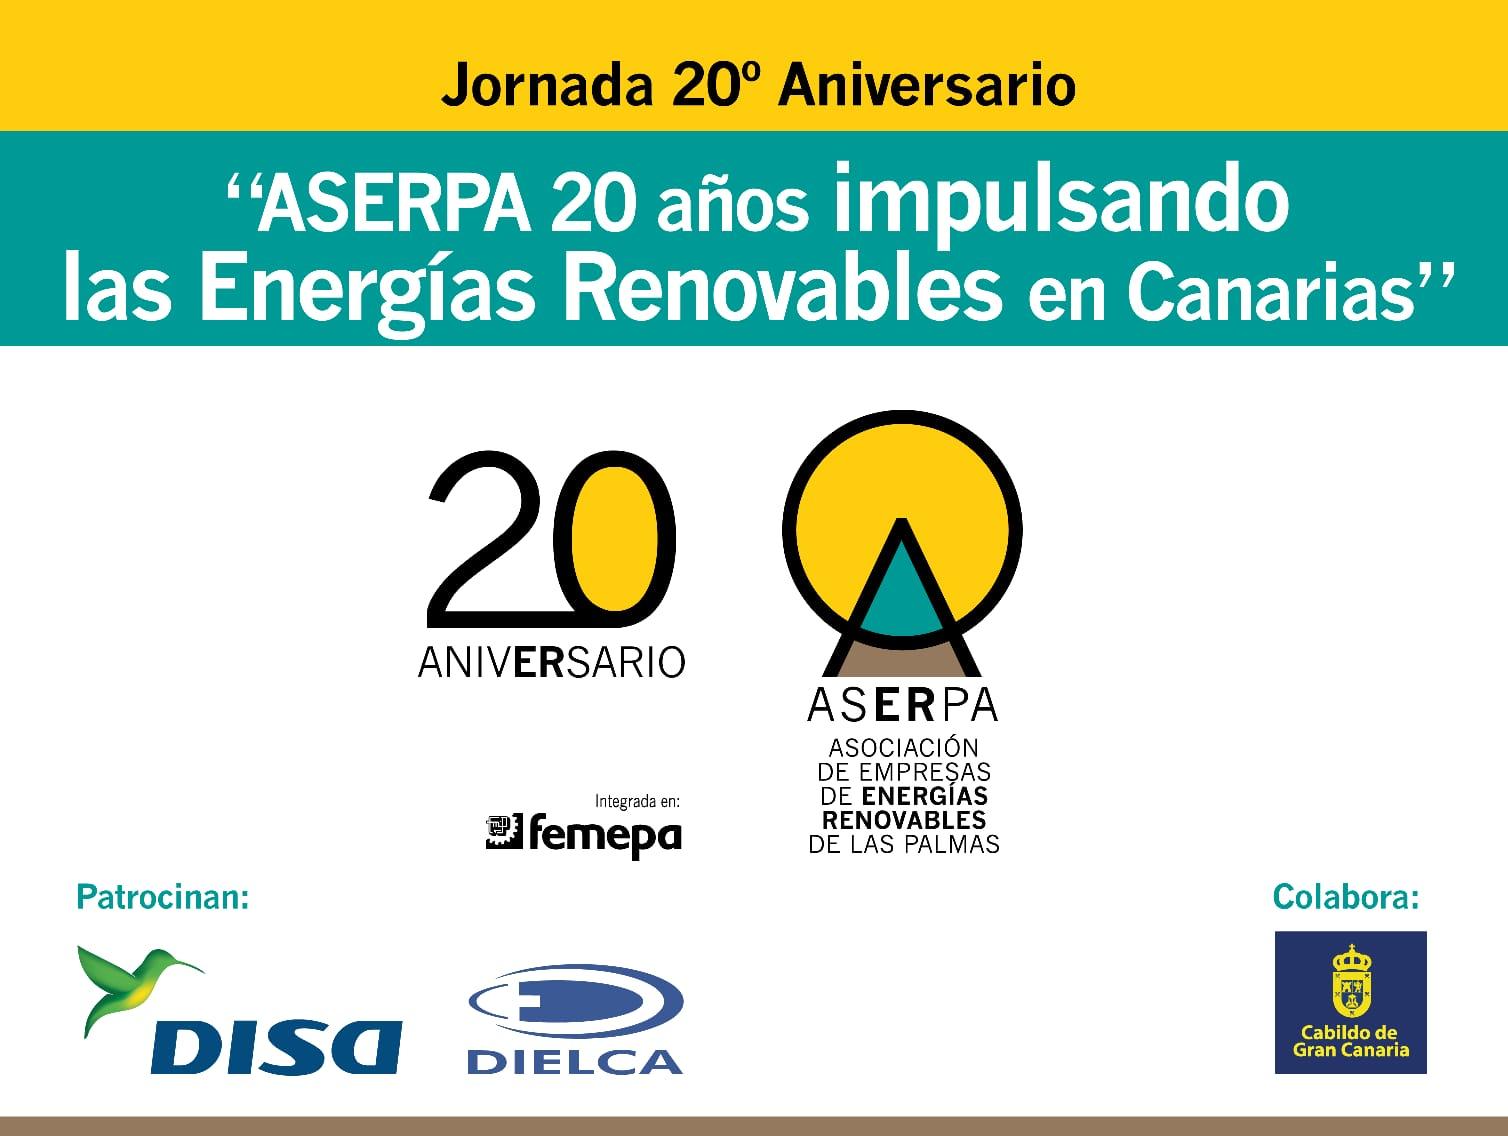 Aserpa celebra su 20º Aniversario